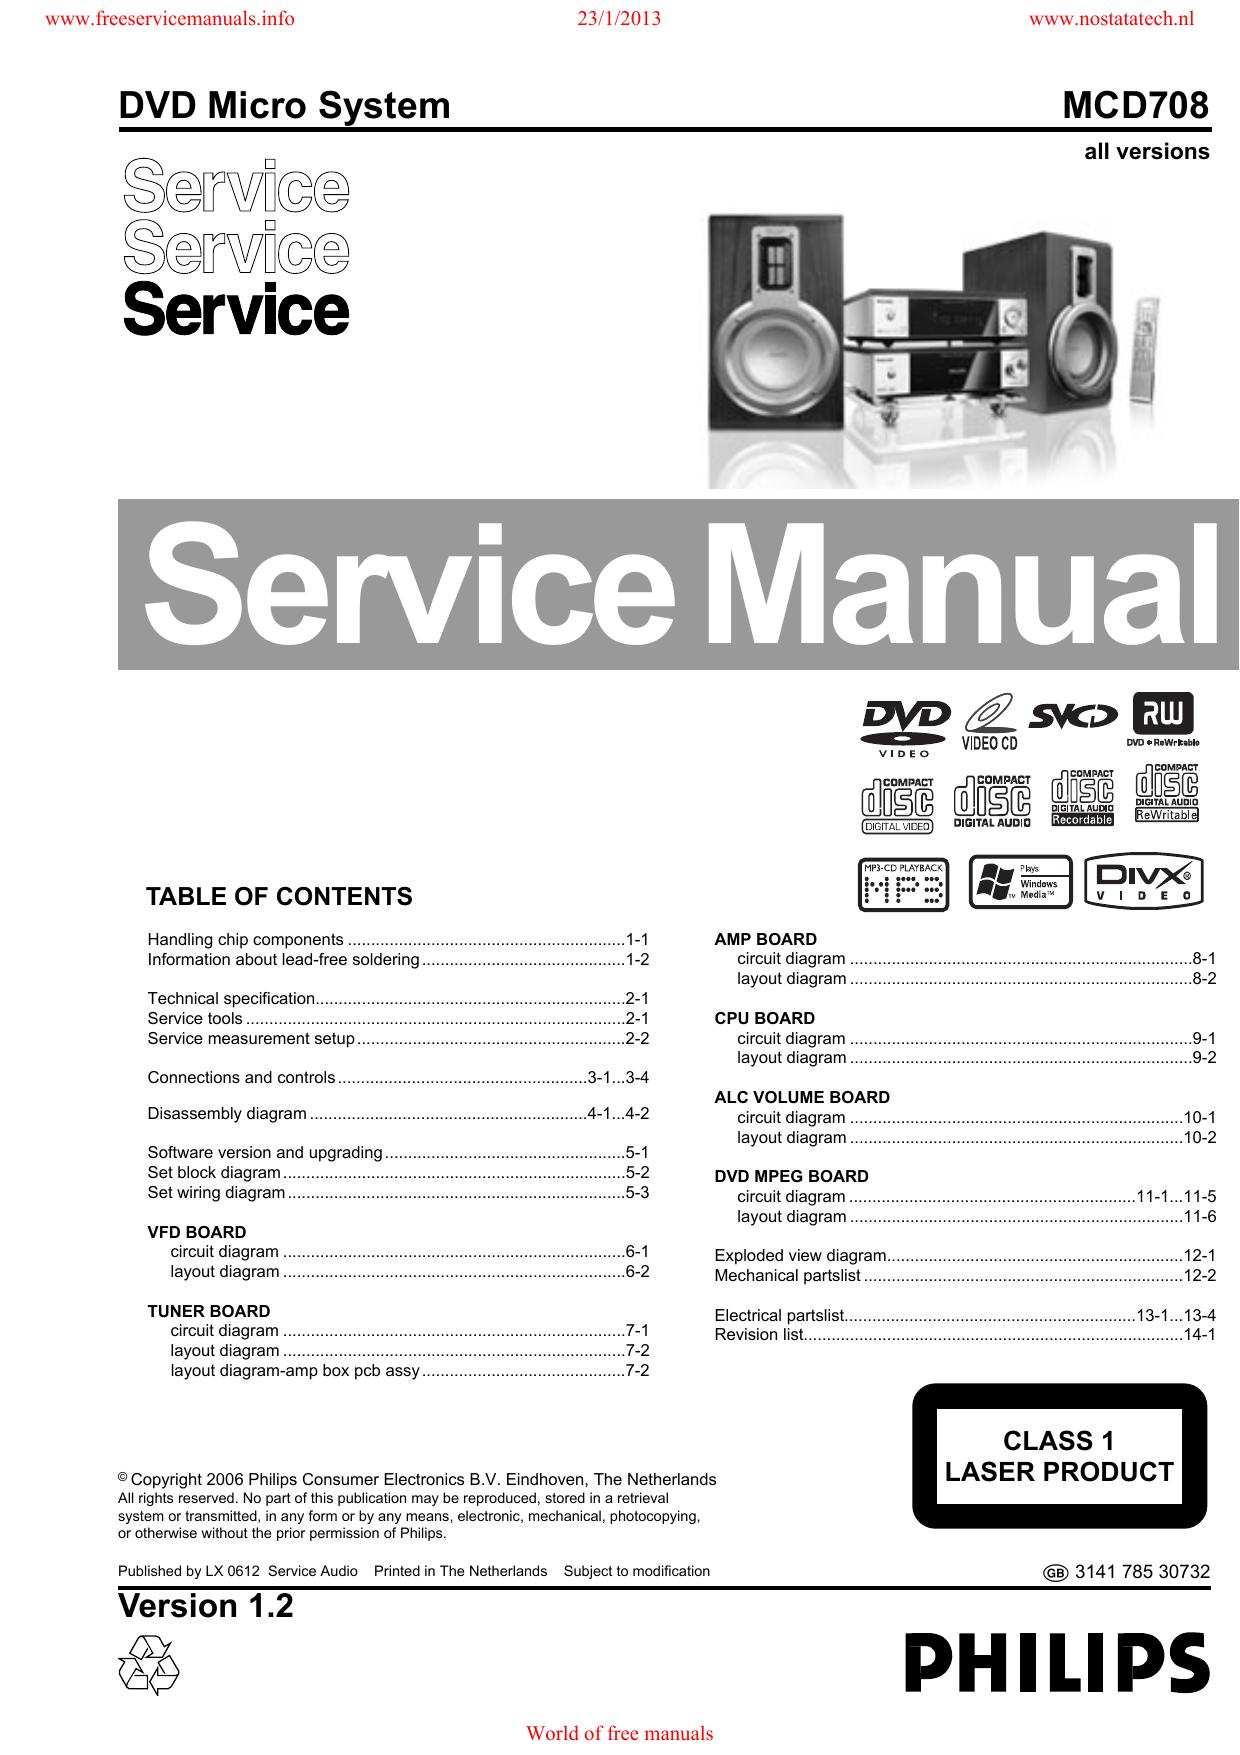 MCD708 DVD Micro System | manualzz com